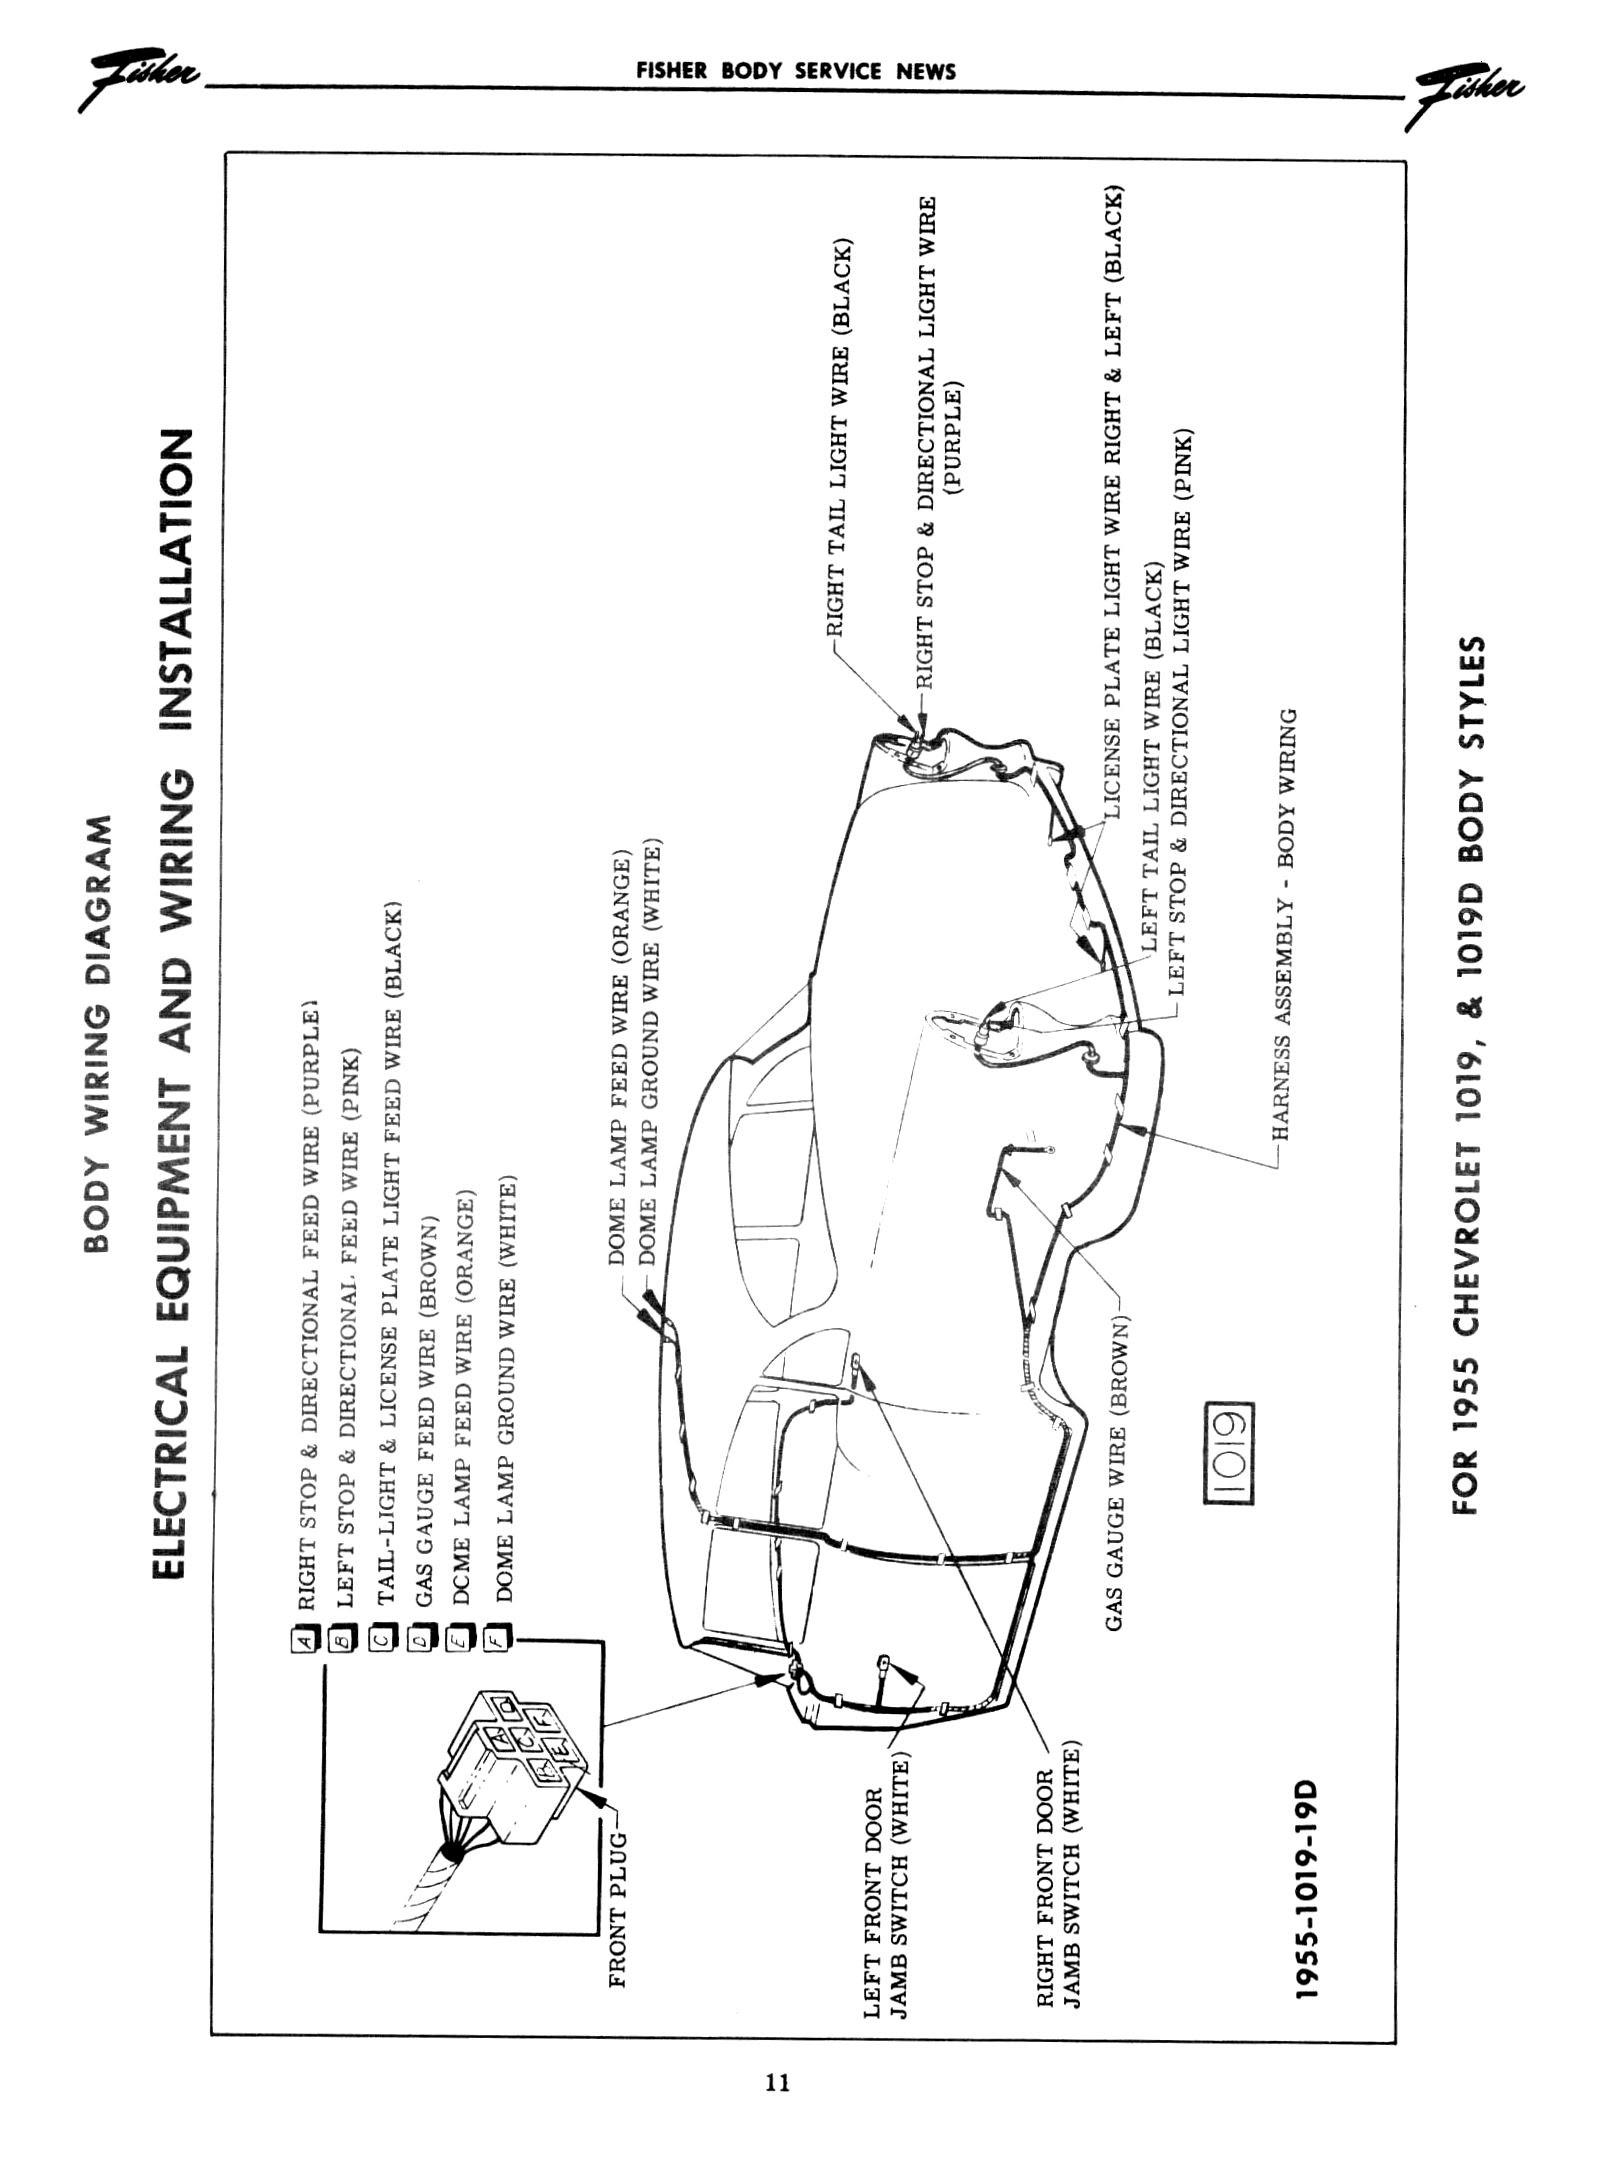 Ford L9000 Wiring Diagram Brakelight Wiring Diagram